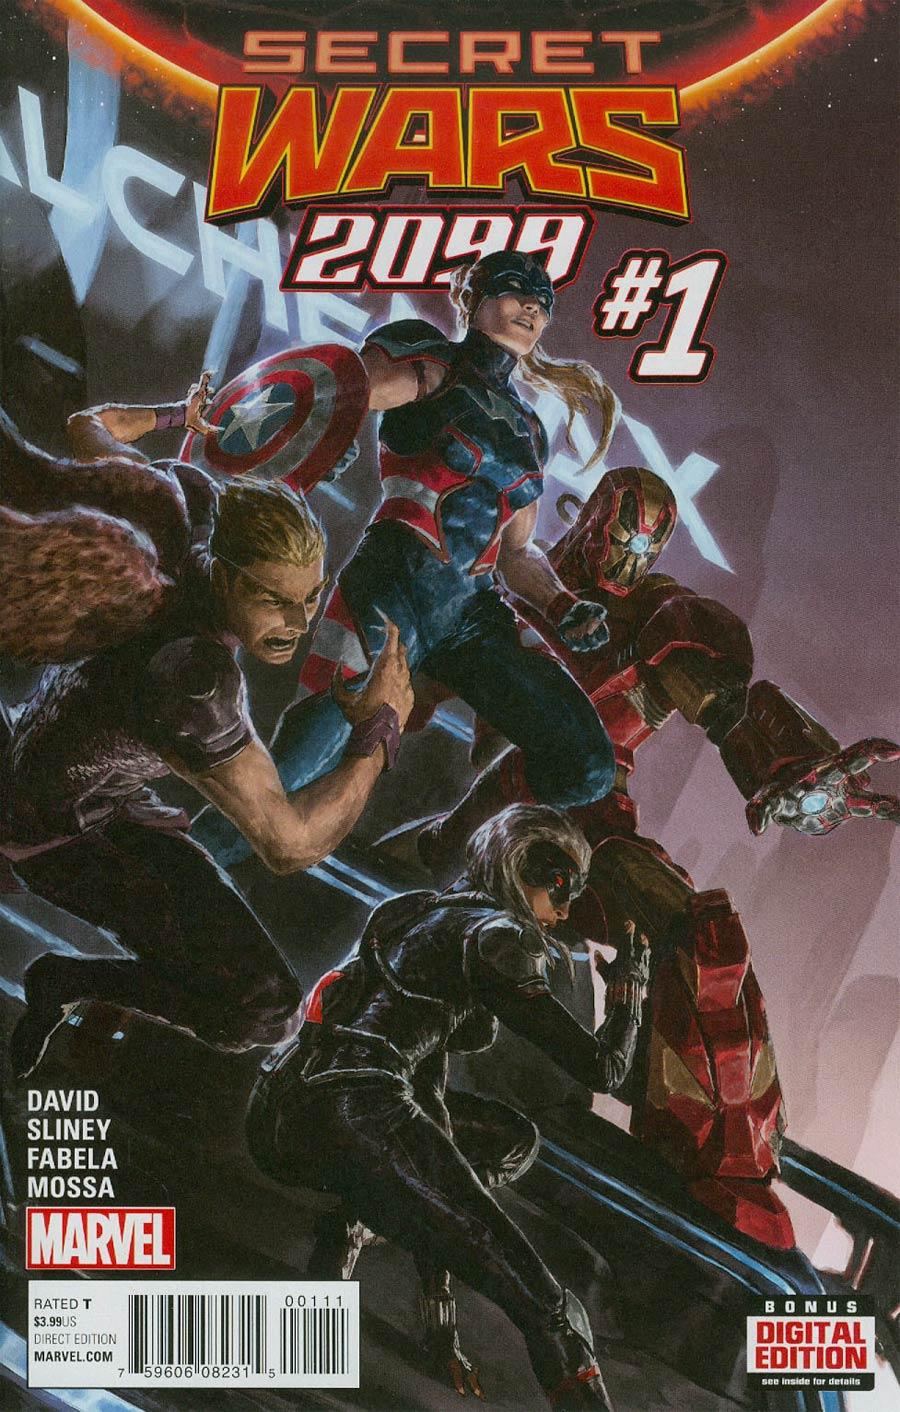 Secret Wars 2099 #1 Cover A Regular Dave Rapoza Cover (Secret Wars Warzones Tie-In)